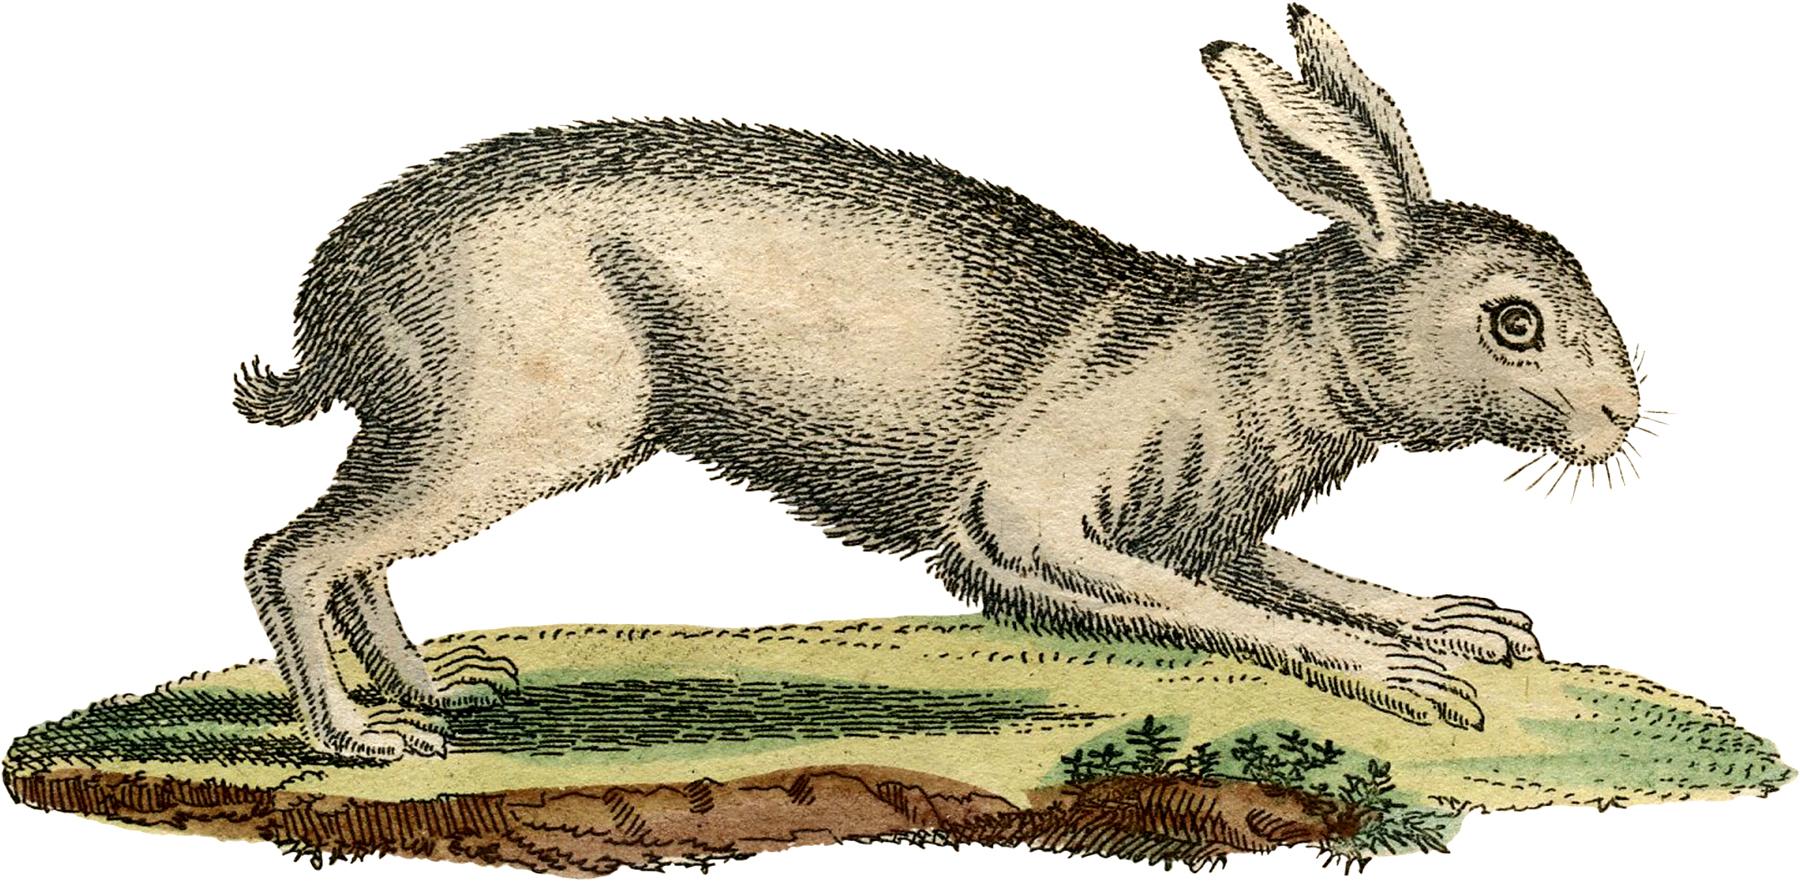 Vintage White Rabbit Image The Graphics Fairy